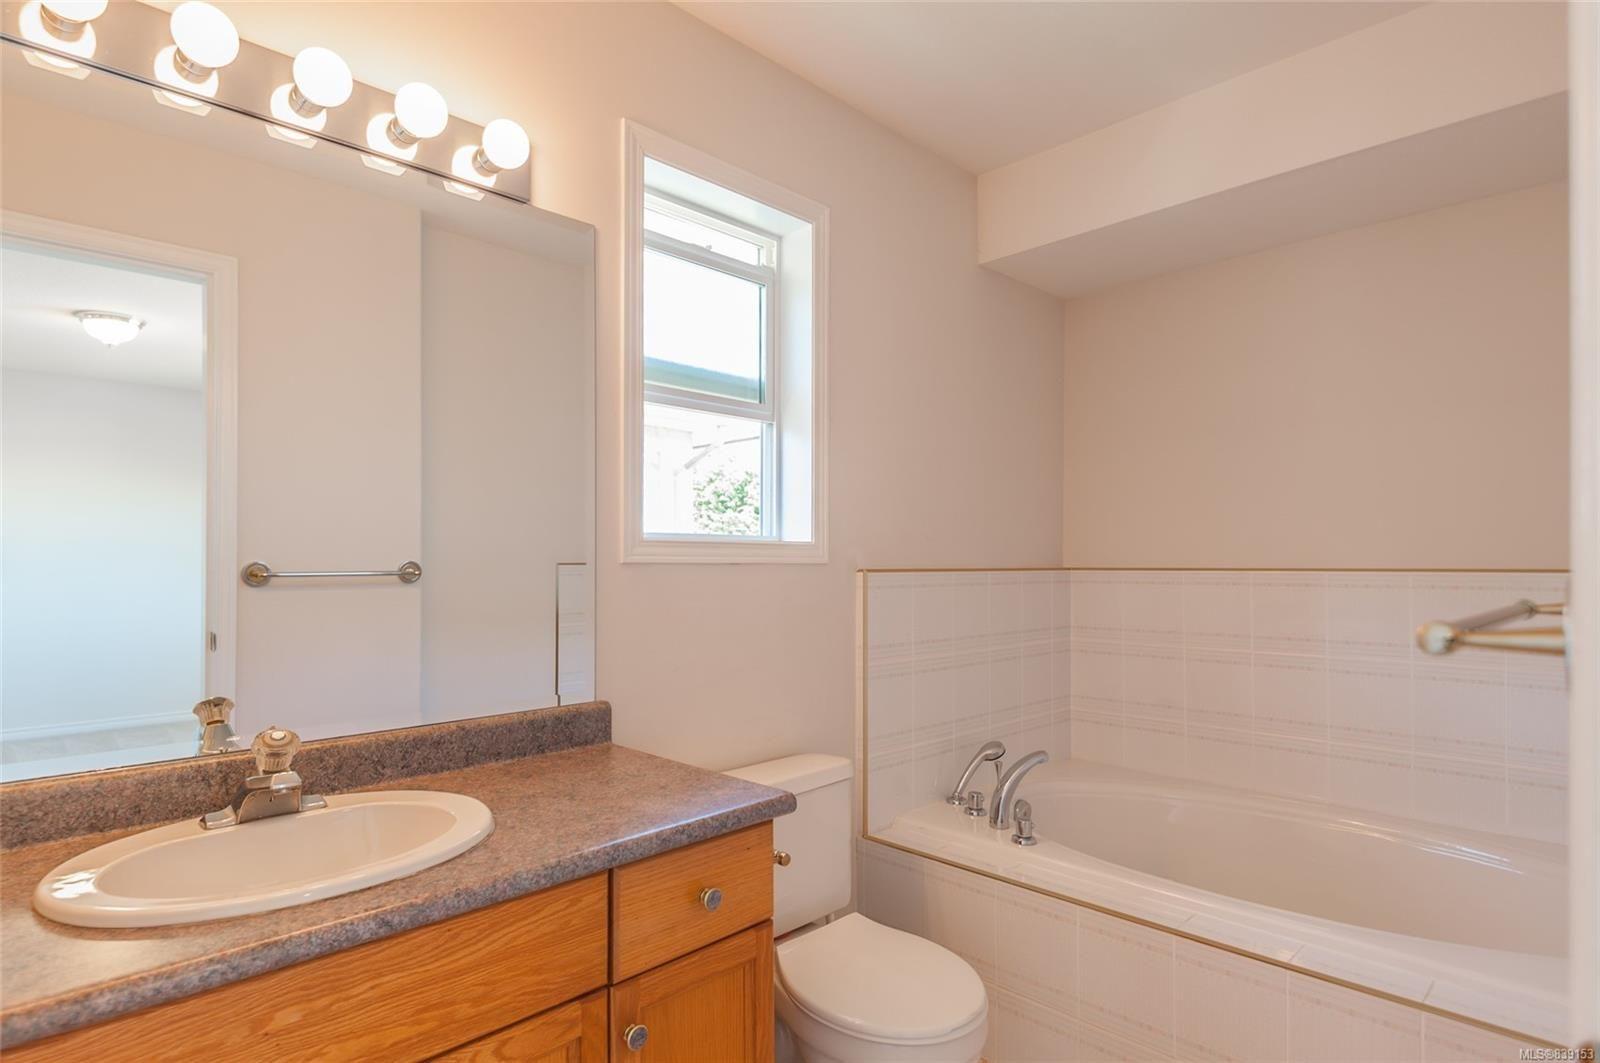 Photo 45: Photos: 6412 Dover Rd in NANAIMO: Na North Nanaimo House for sale (Nanaimo)  : MLS®# 839153